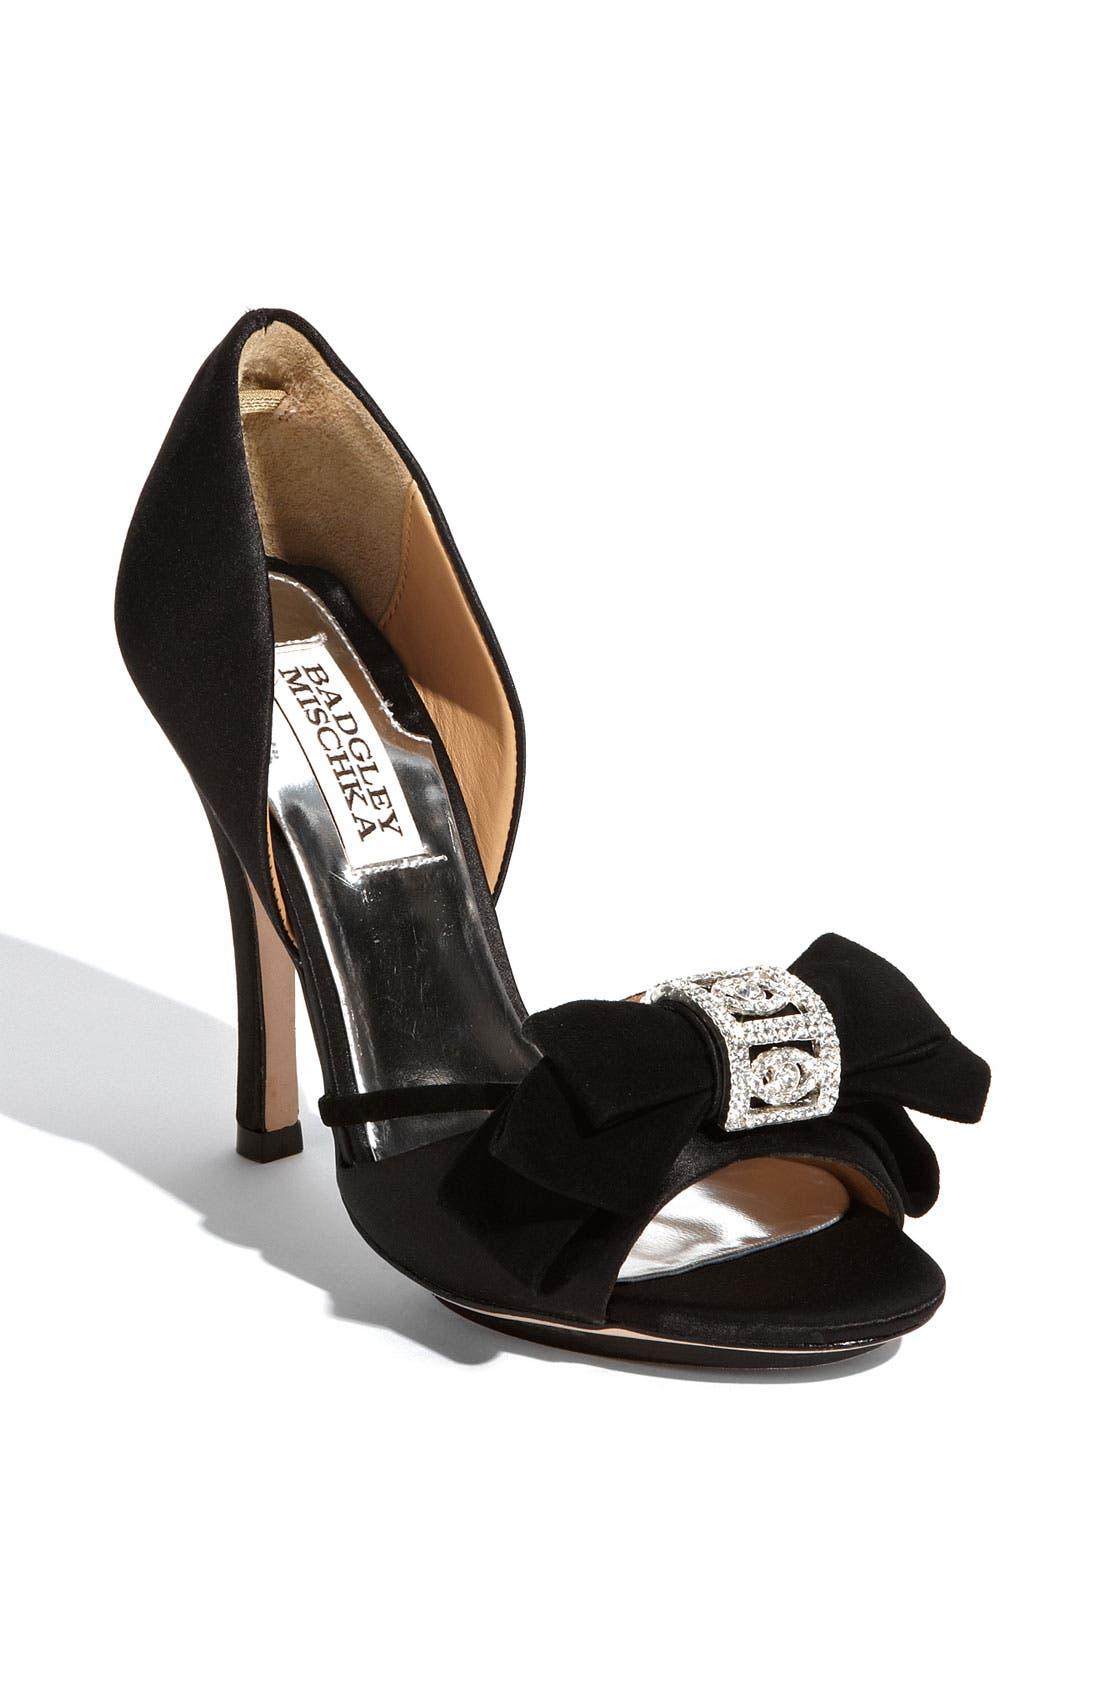 Main Image - Badgley Mischka 'Babette' Sandal